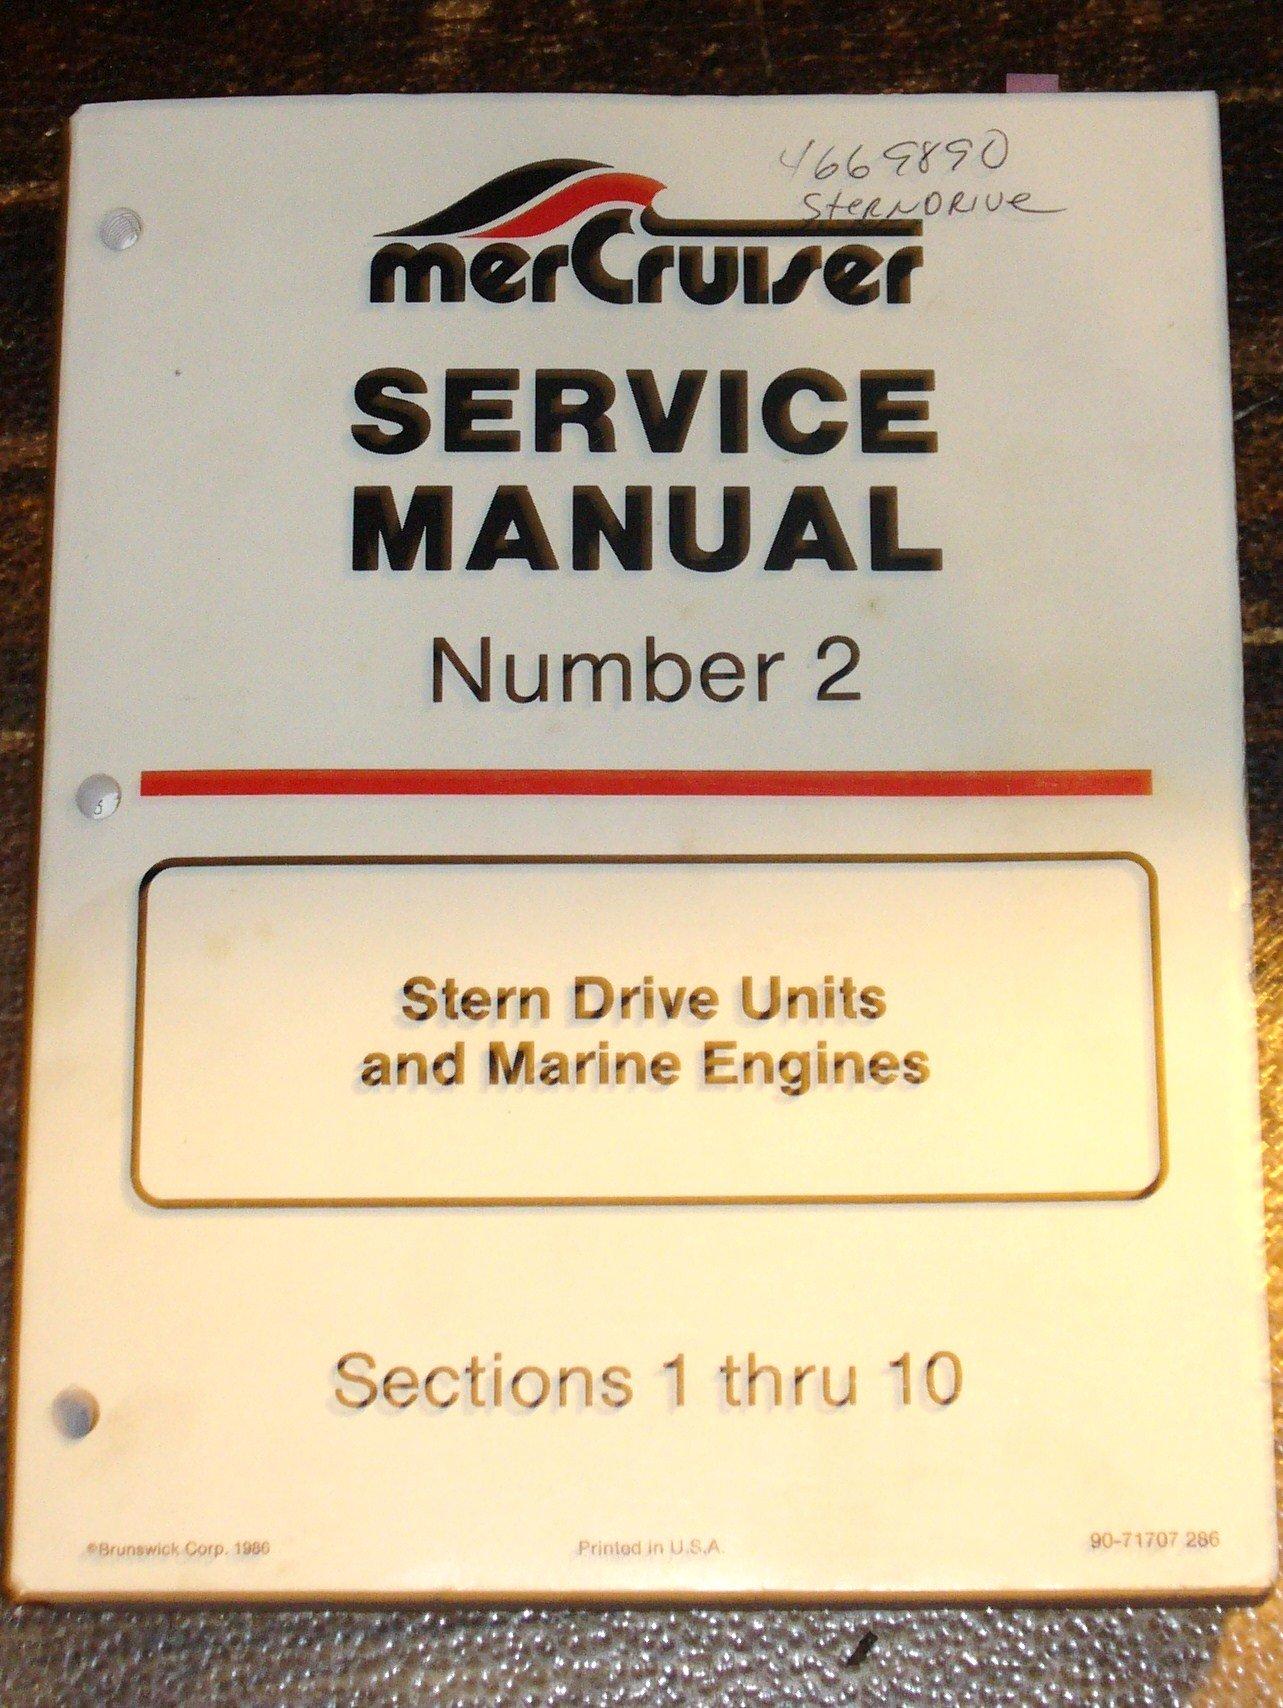 mercruiser service manual number 2 stern drive units and marine rh amazon com mercruiser service manual 10 pdf mercruiser service manual 11 pdf